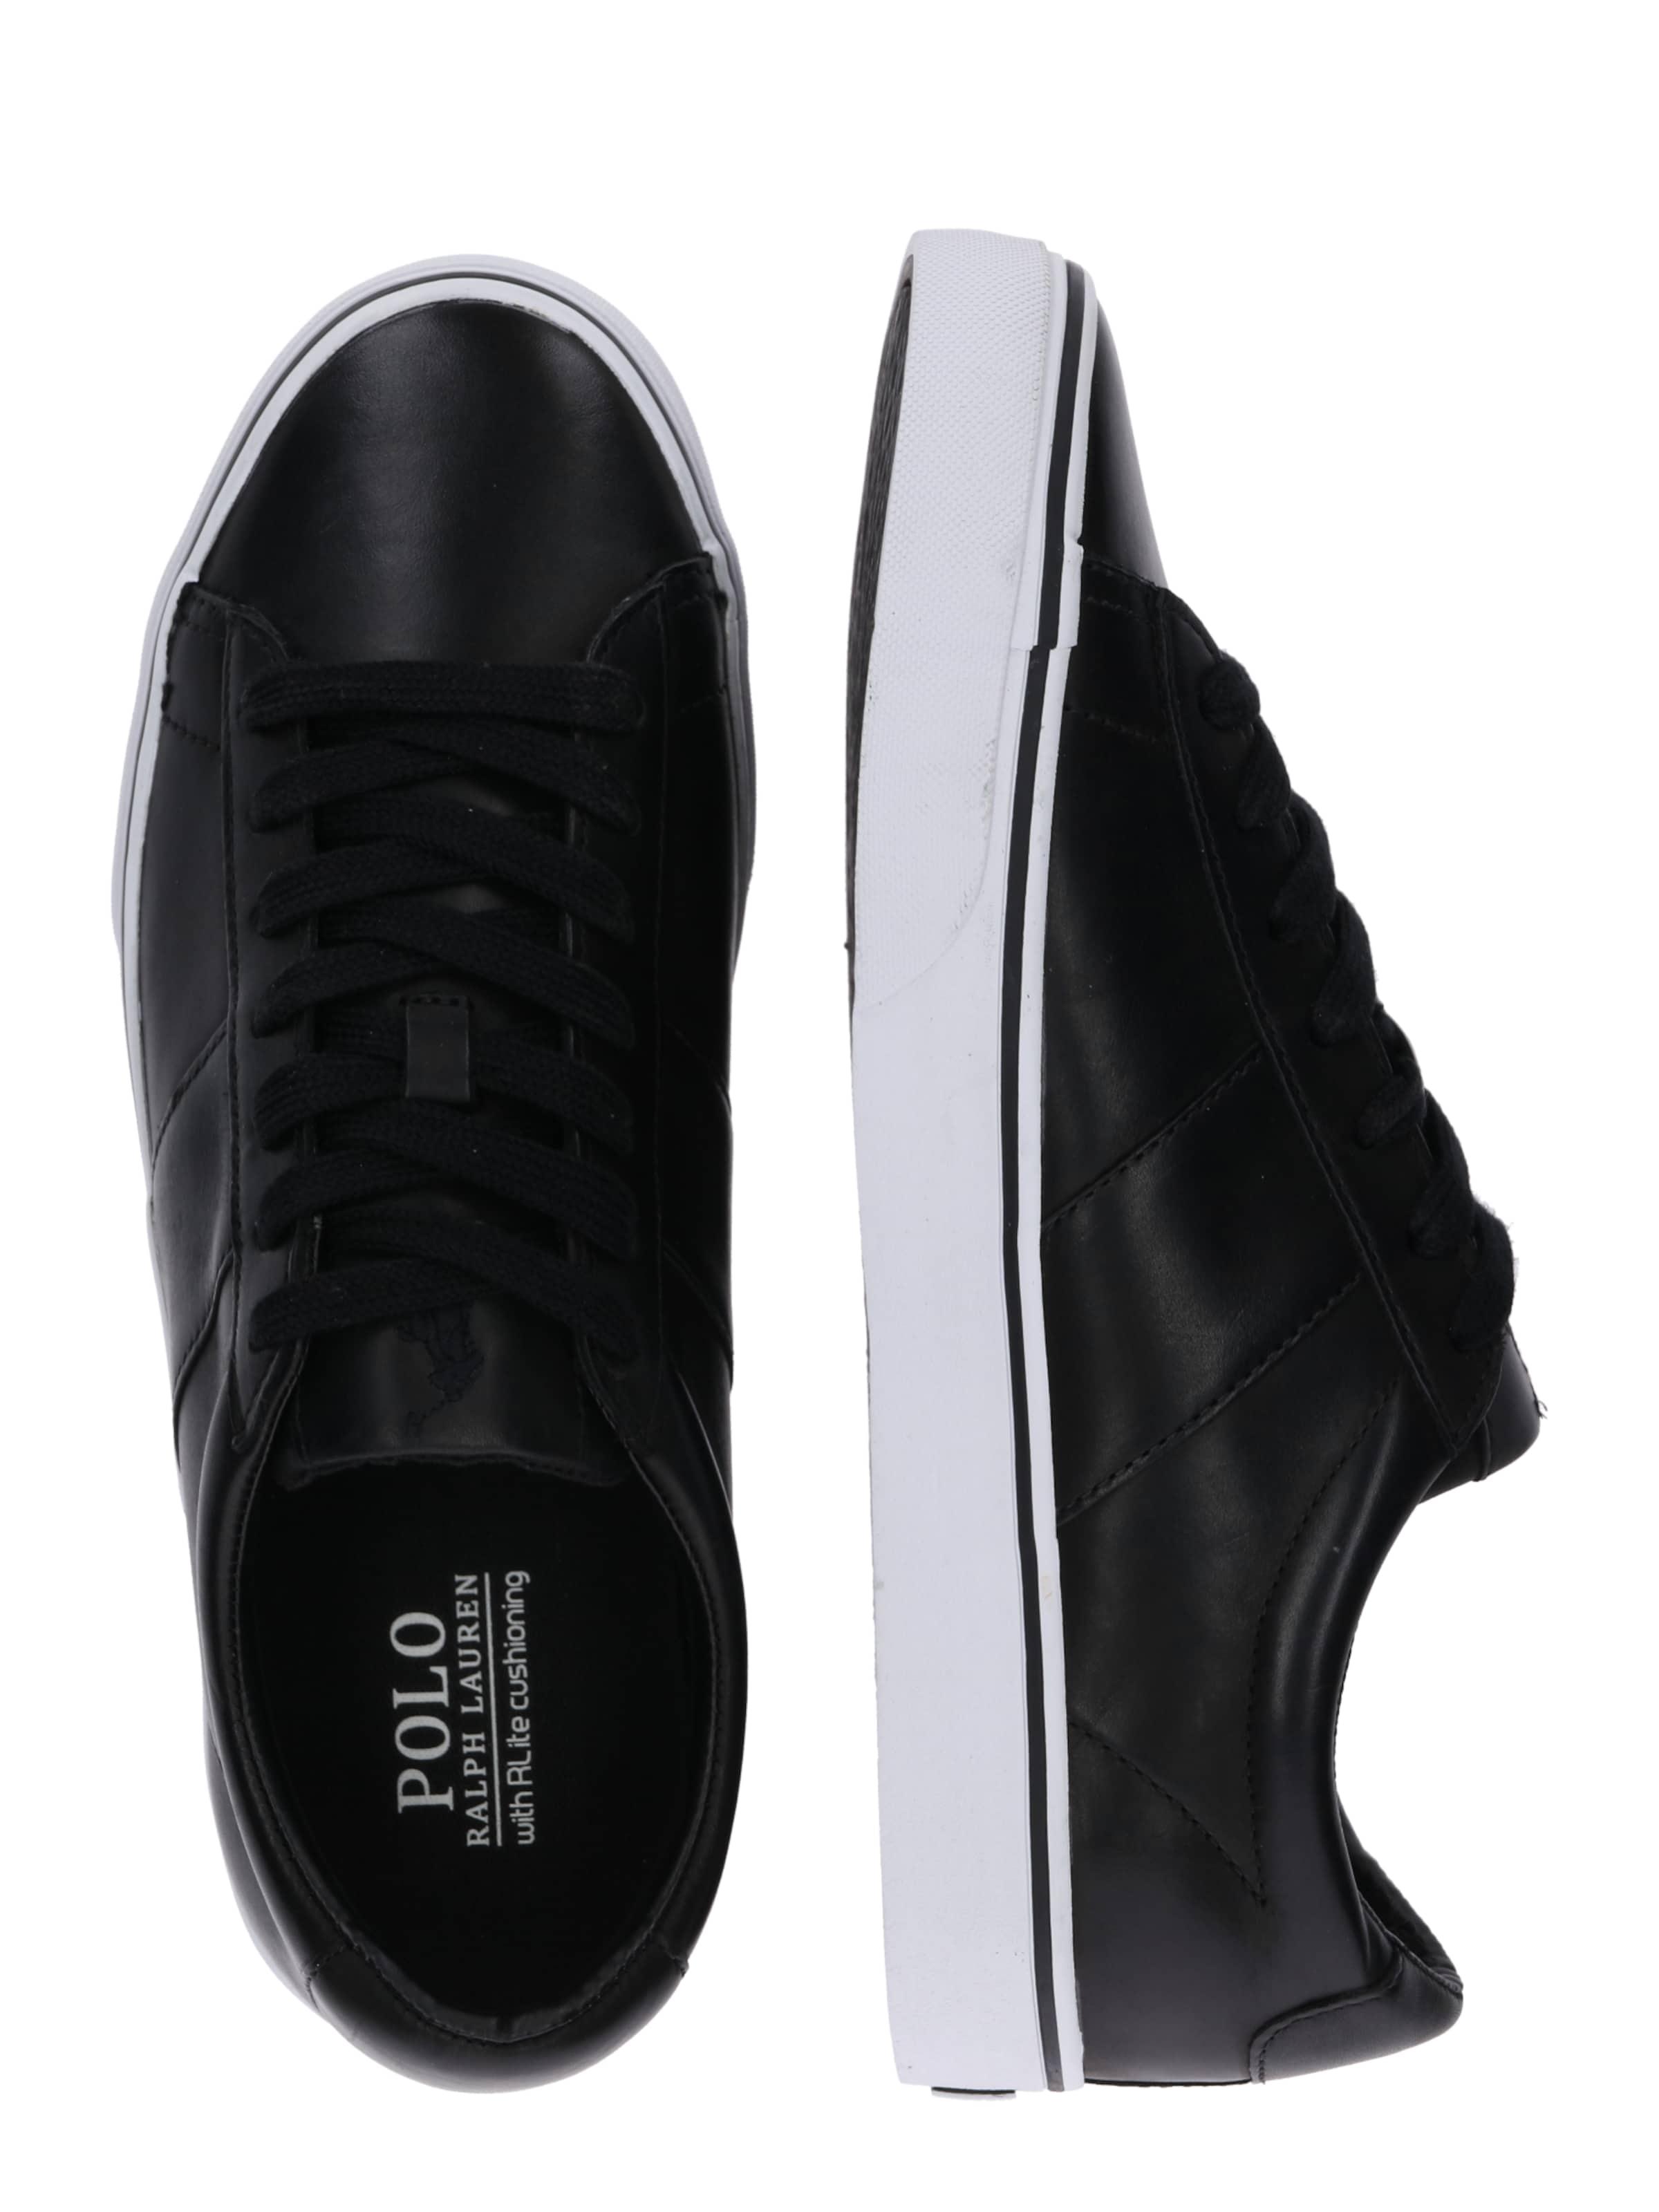 In 'sayer Schwarz Sneaker Leather' Lauren Polo Ralph mbfIv6g7Yy